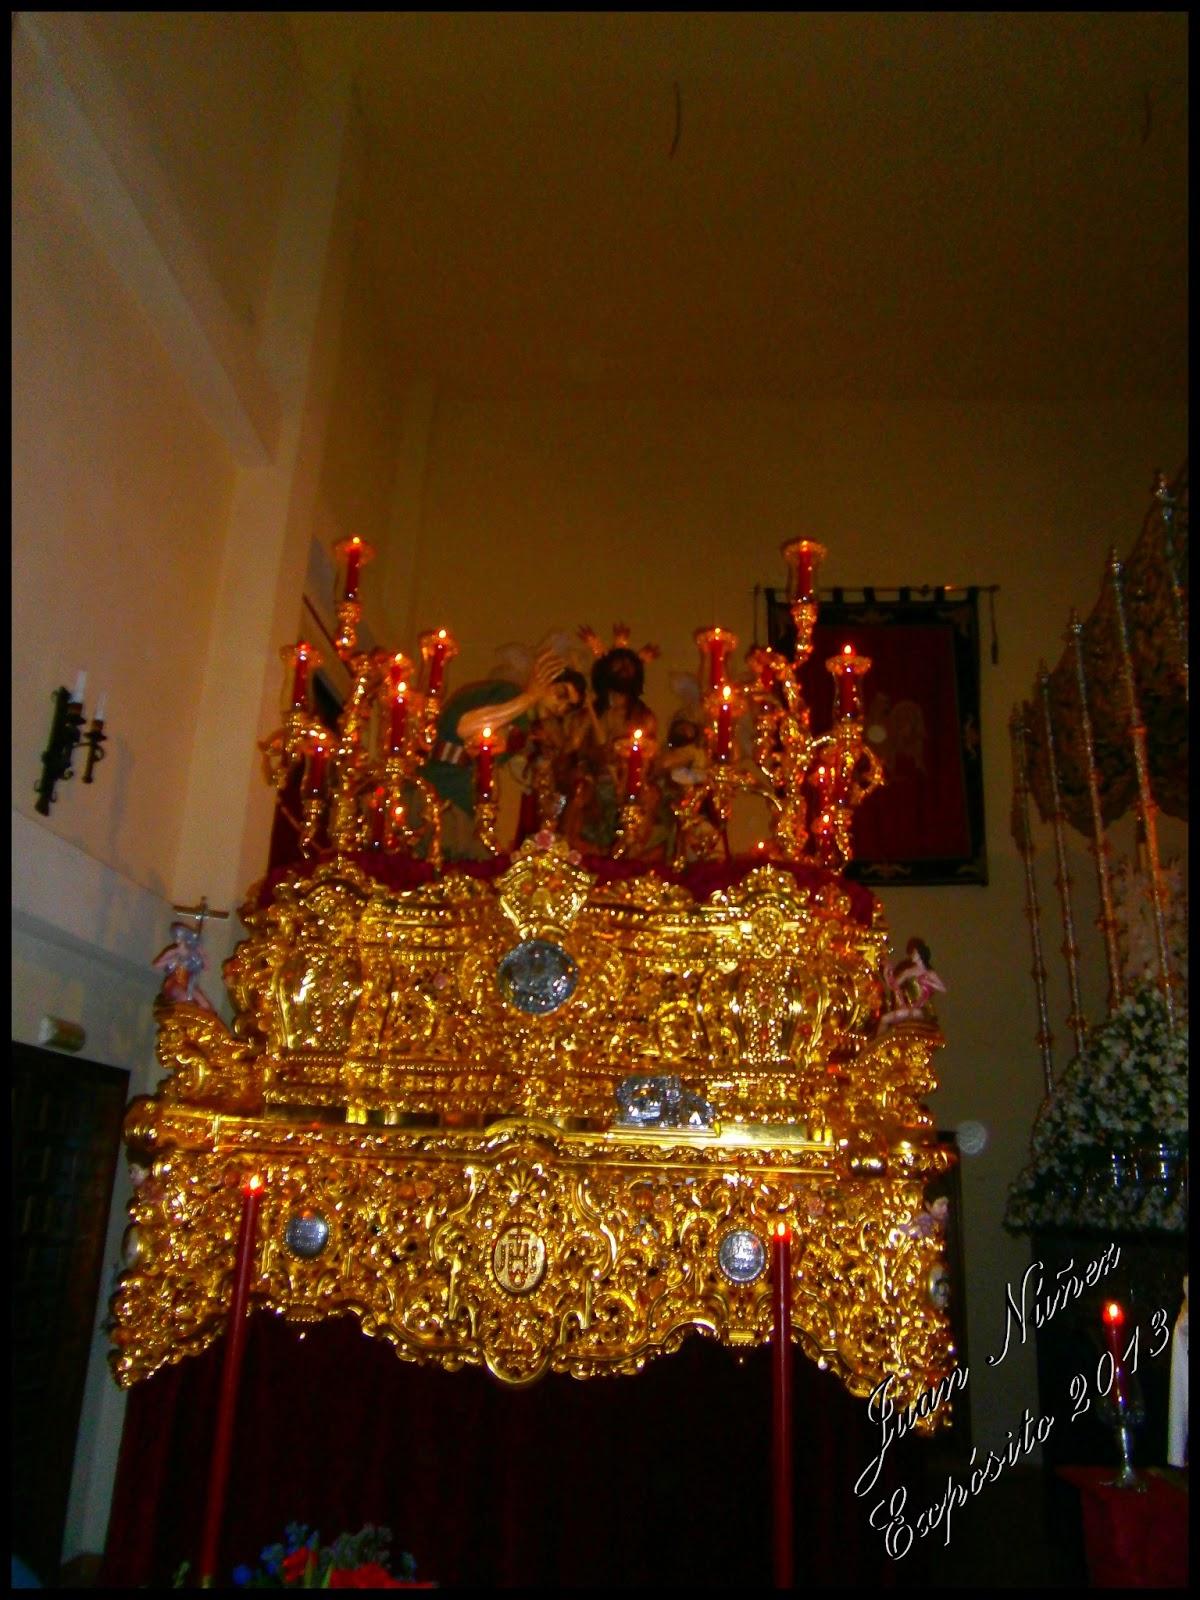 Fragancias cofrades semana santa c rdoba 2013 lunes santo - Fragancias de sevilla ...